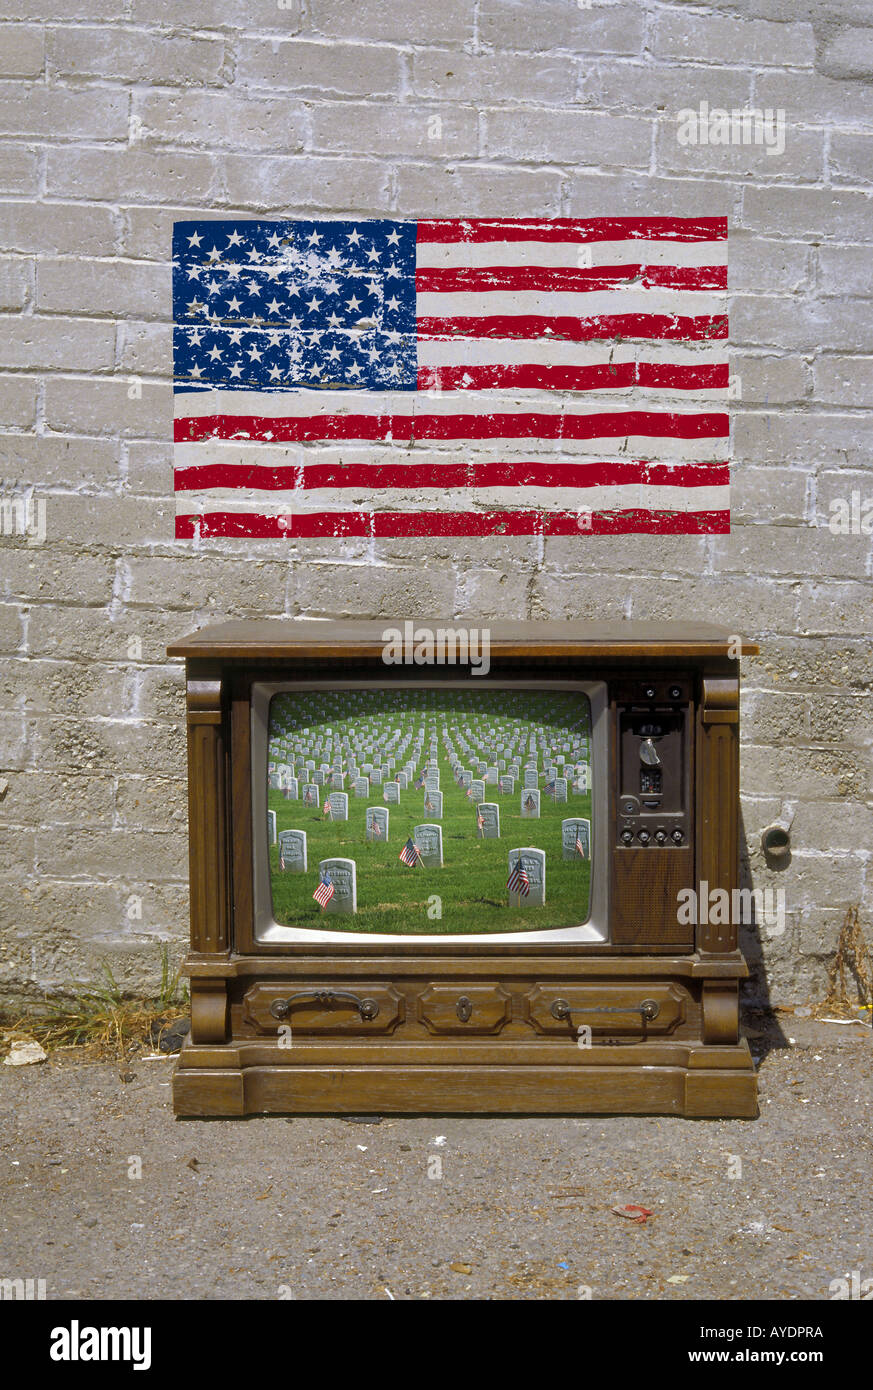 Veterans Cemetery on old style American TV set Stock Photo